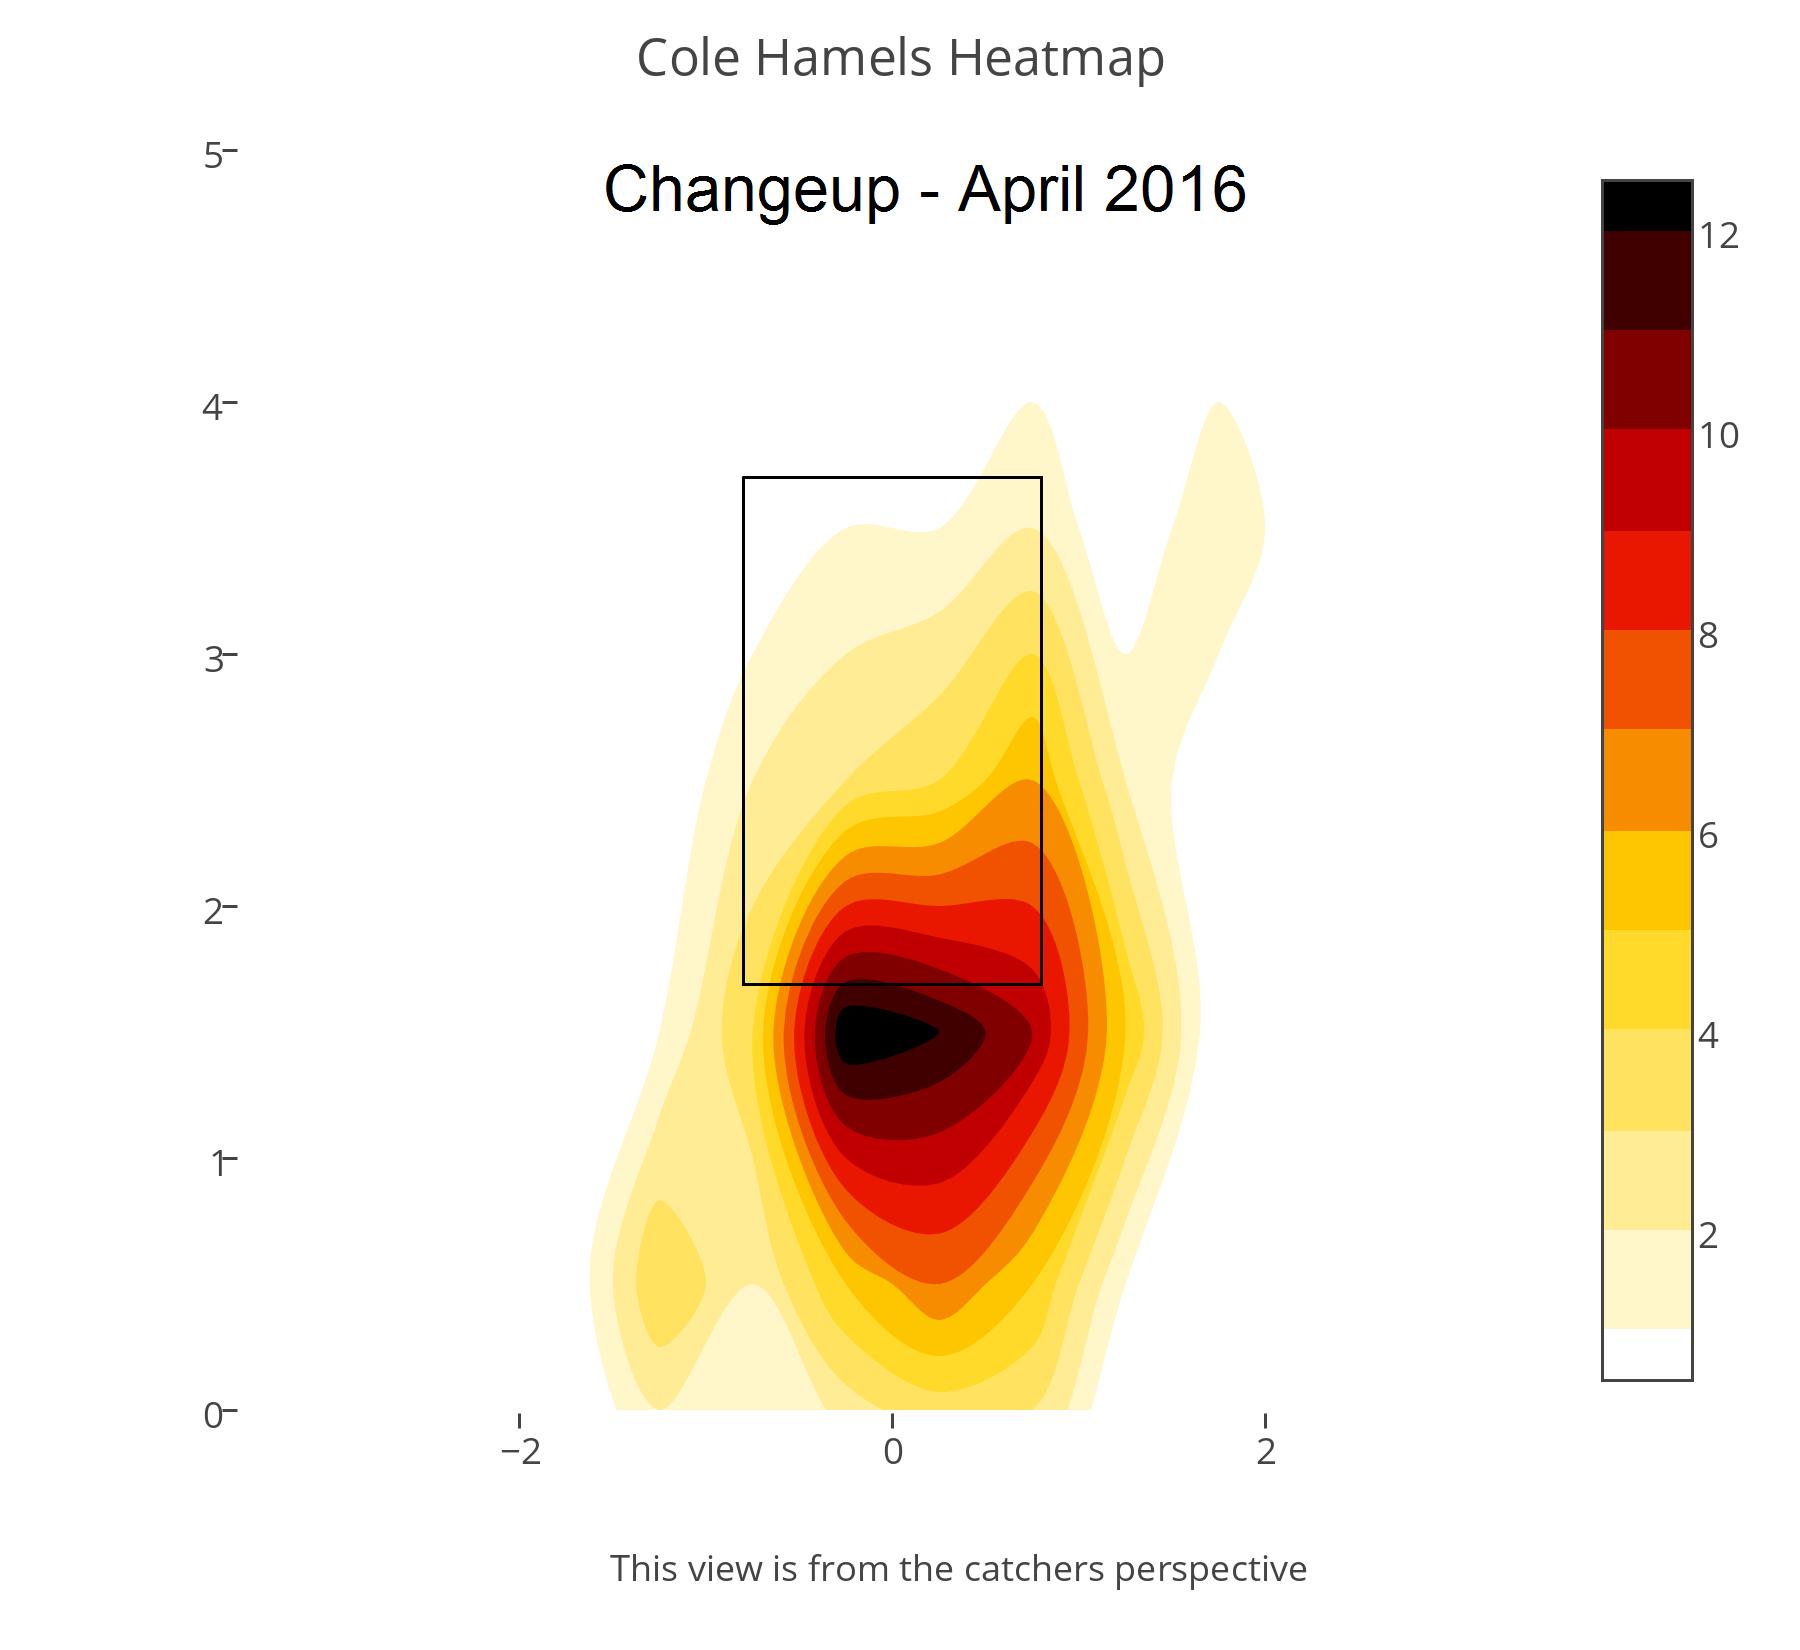 Hamels Changeup Heatmap April 2016